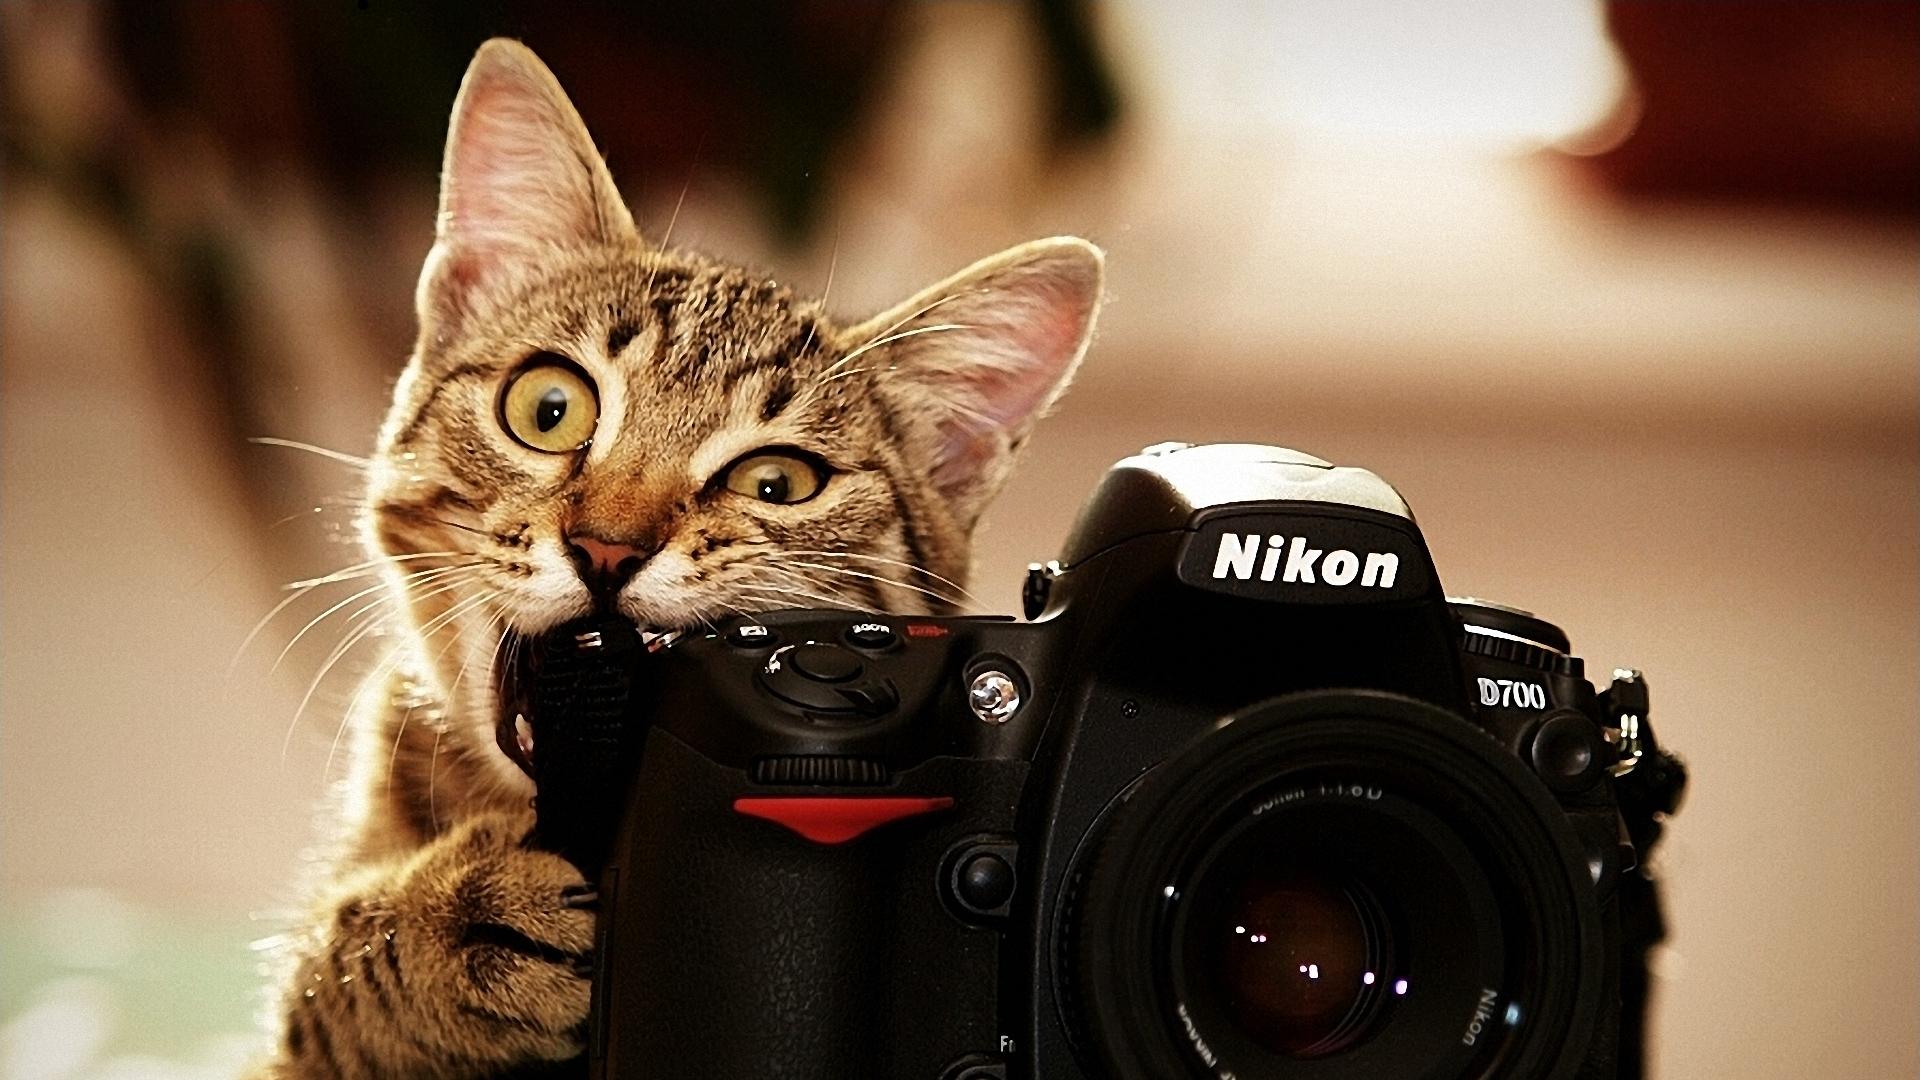 Cats Bite Funny Cameras Nikon Kittens Photo Camera Biting